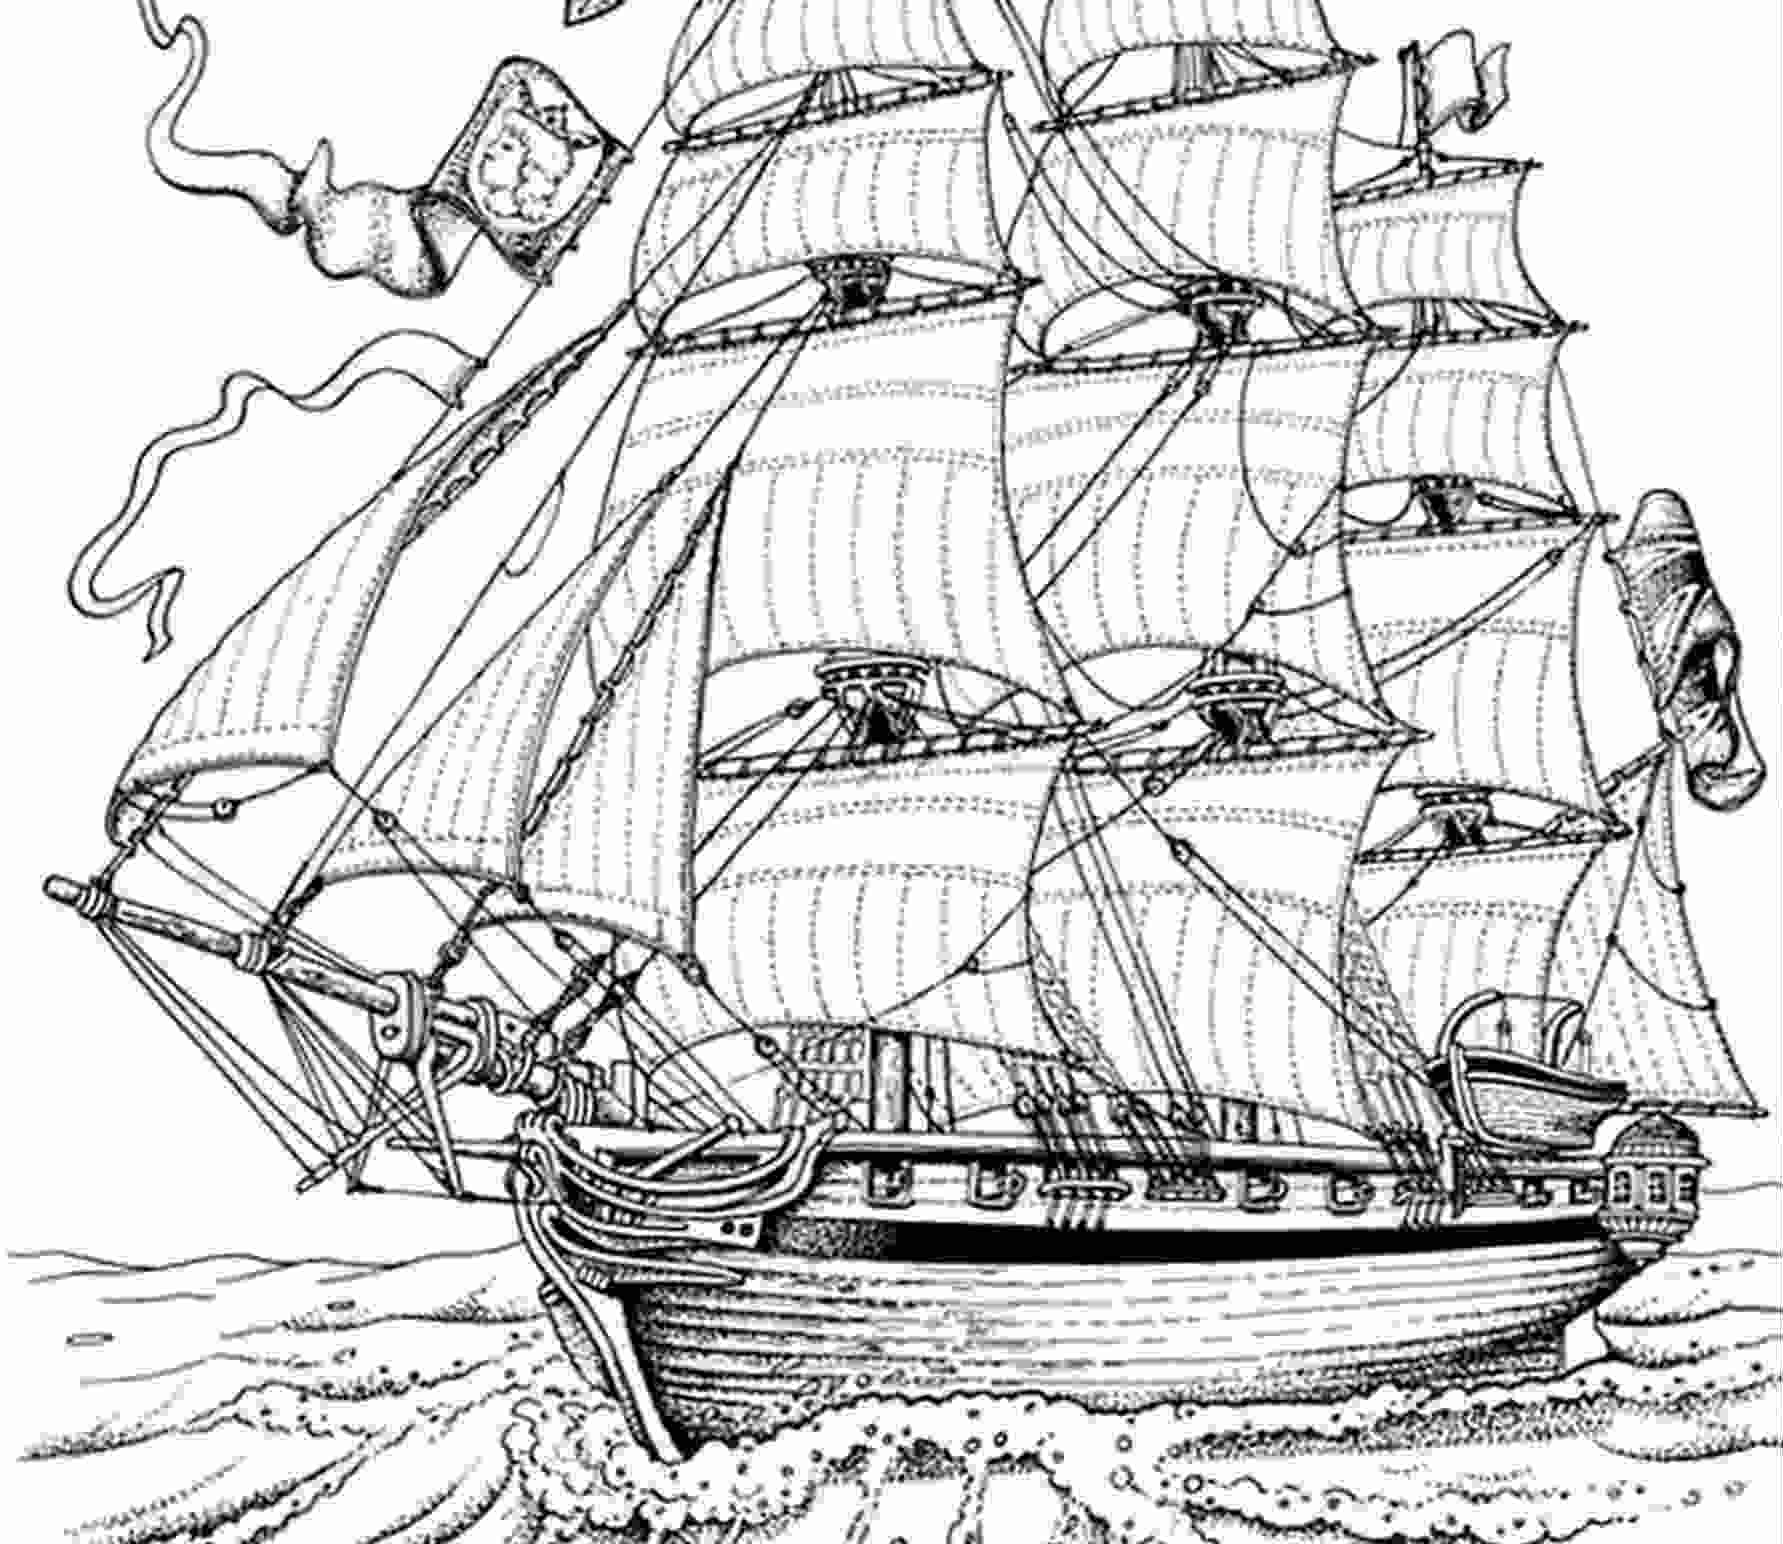 Vedkokeven Blogspot Com Dessin De Pirate A Imprimer Gratuit